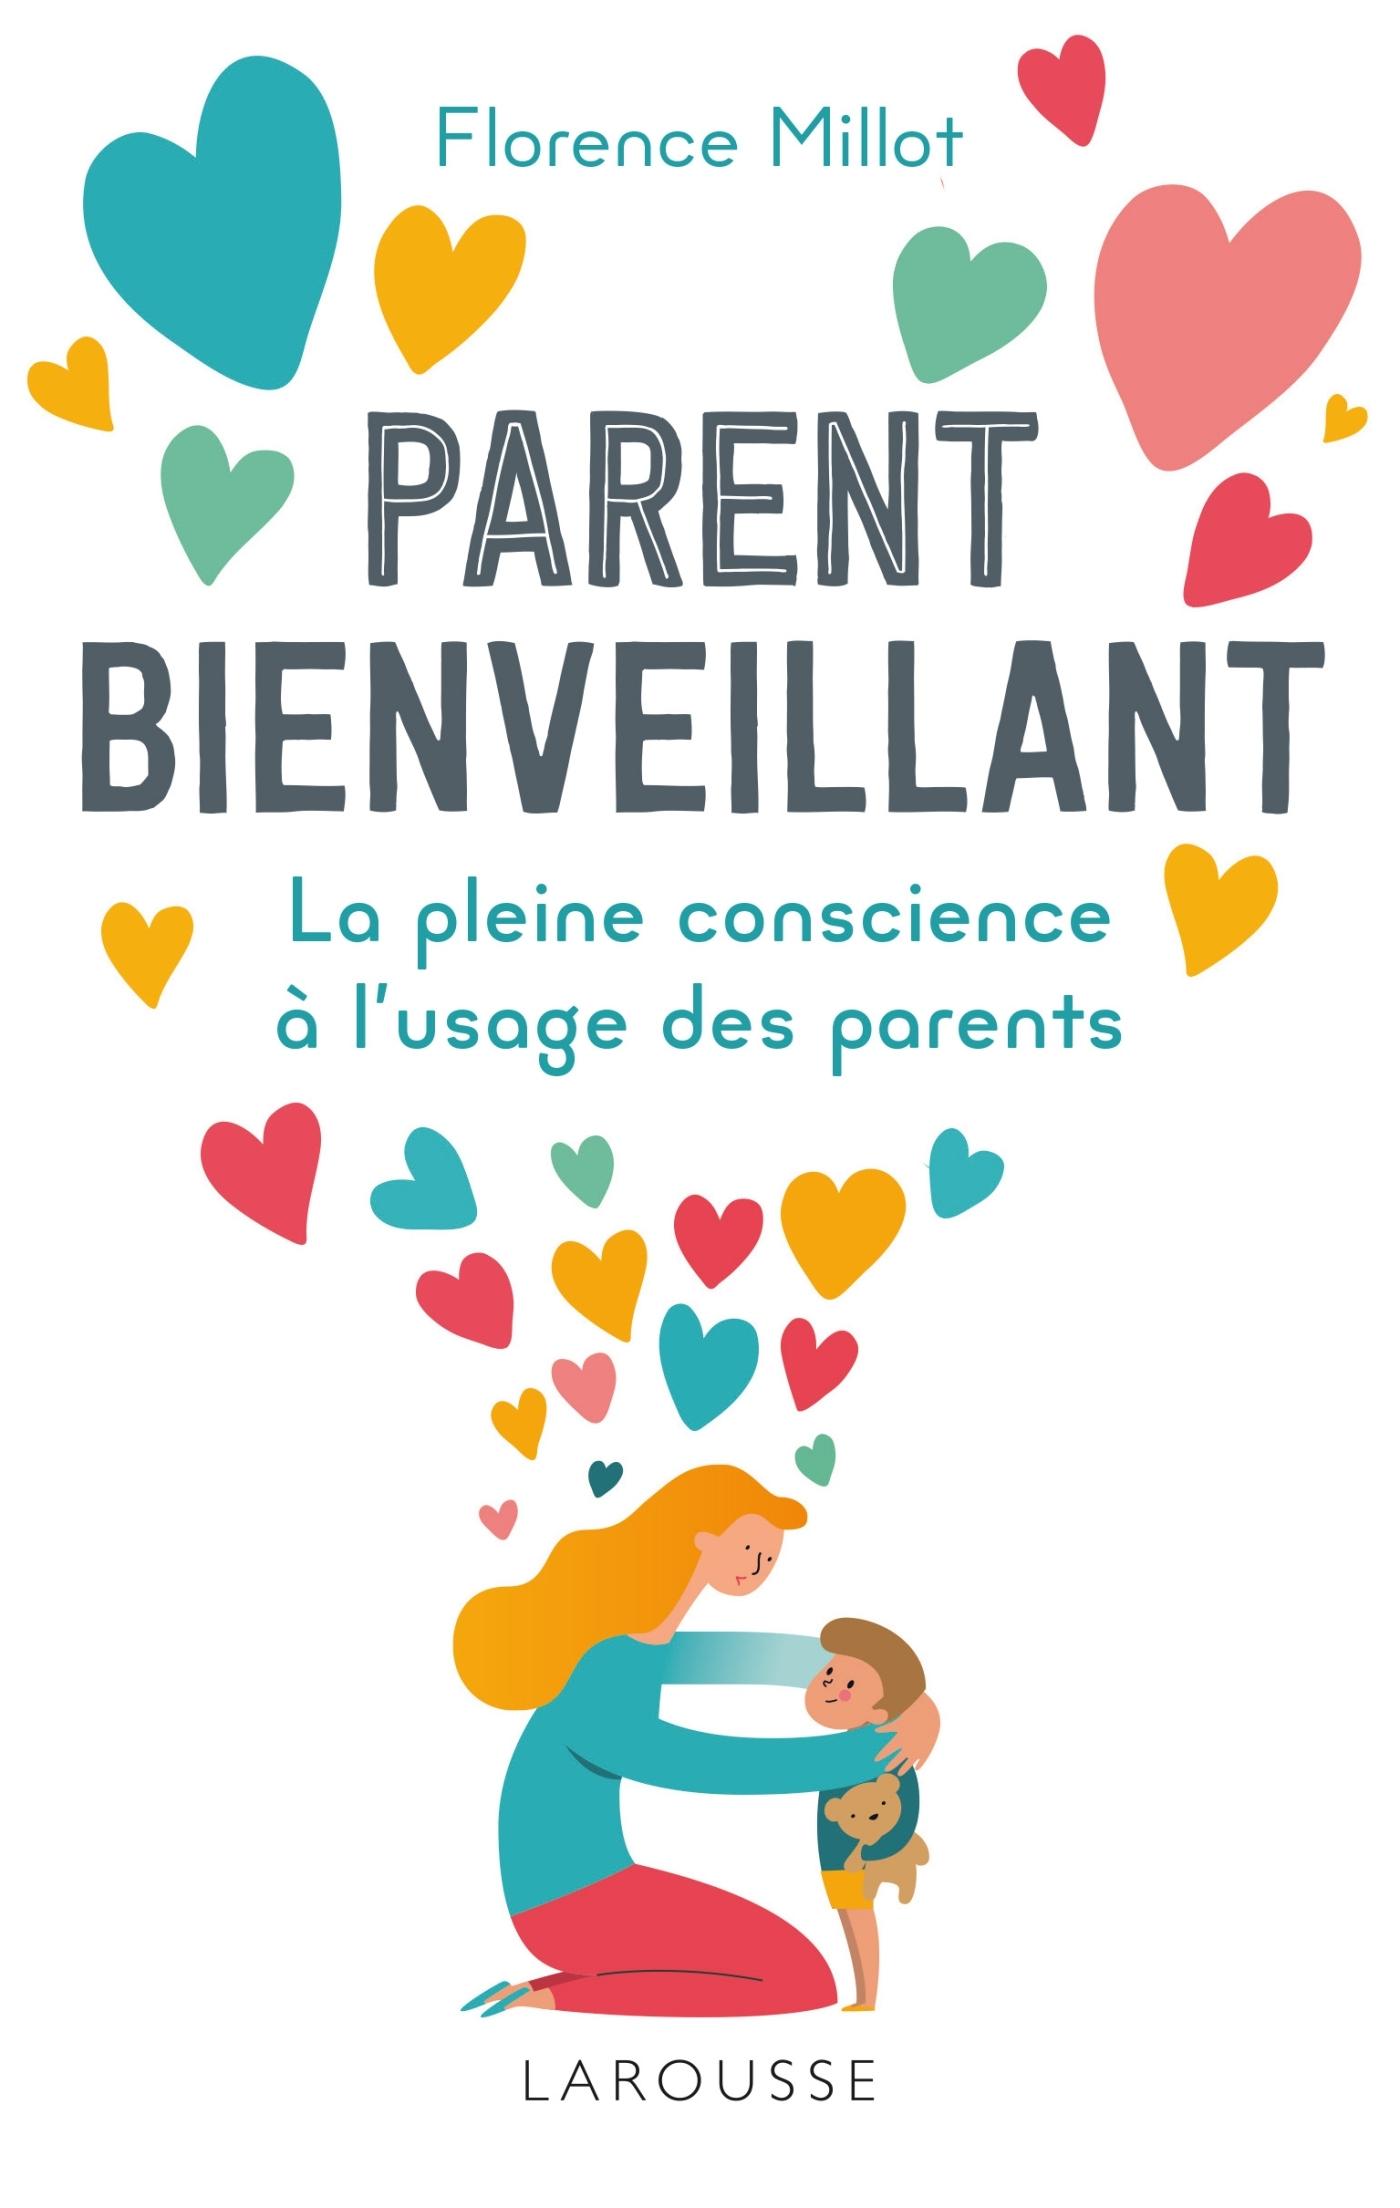 PARENT BIENVEILLANT